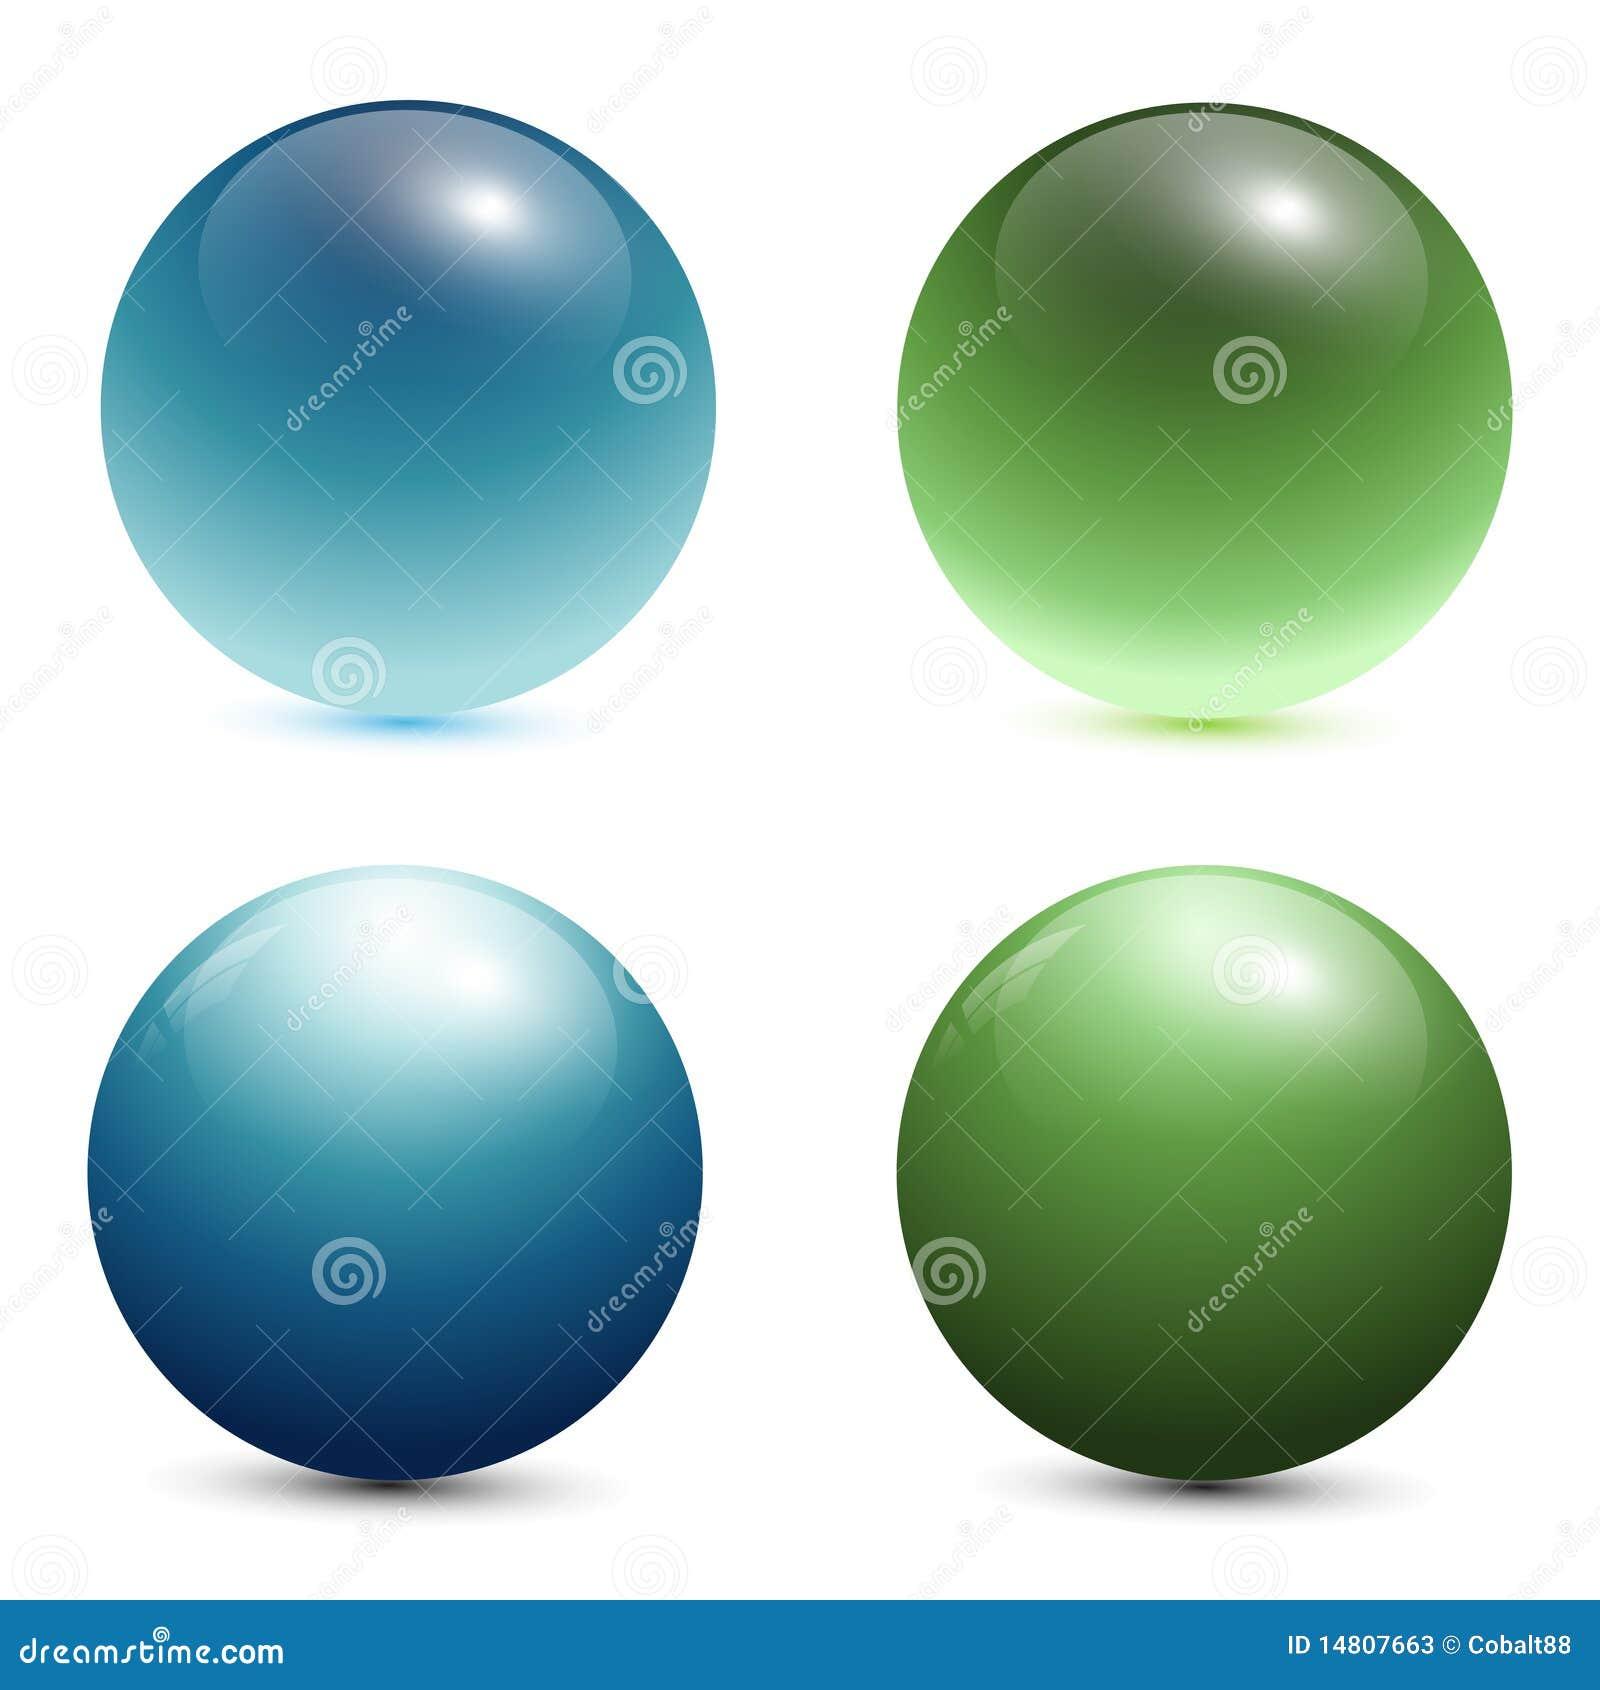 3D glass spheres